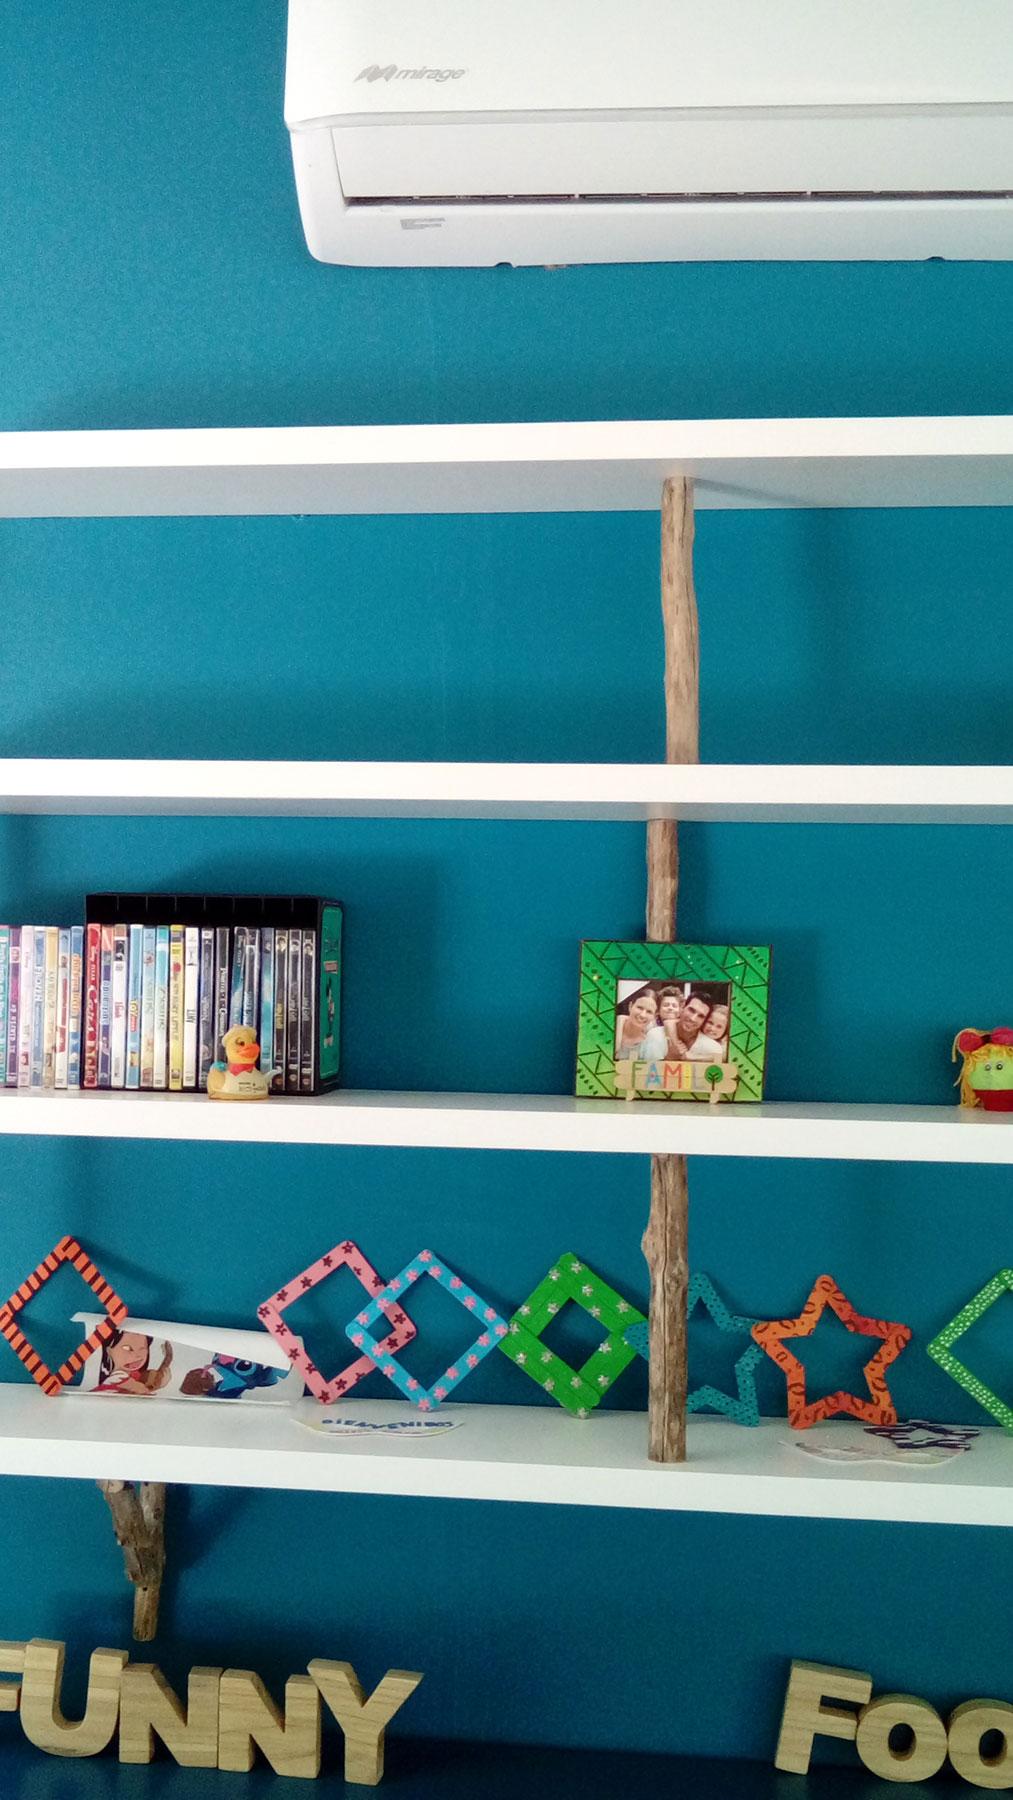 Proyectos SPAD Constructora, Westin Family Kids Club, Repisas creativas, Diseño de Interiores, Arquitectura, Puerto Vallarta, Jalisco, México